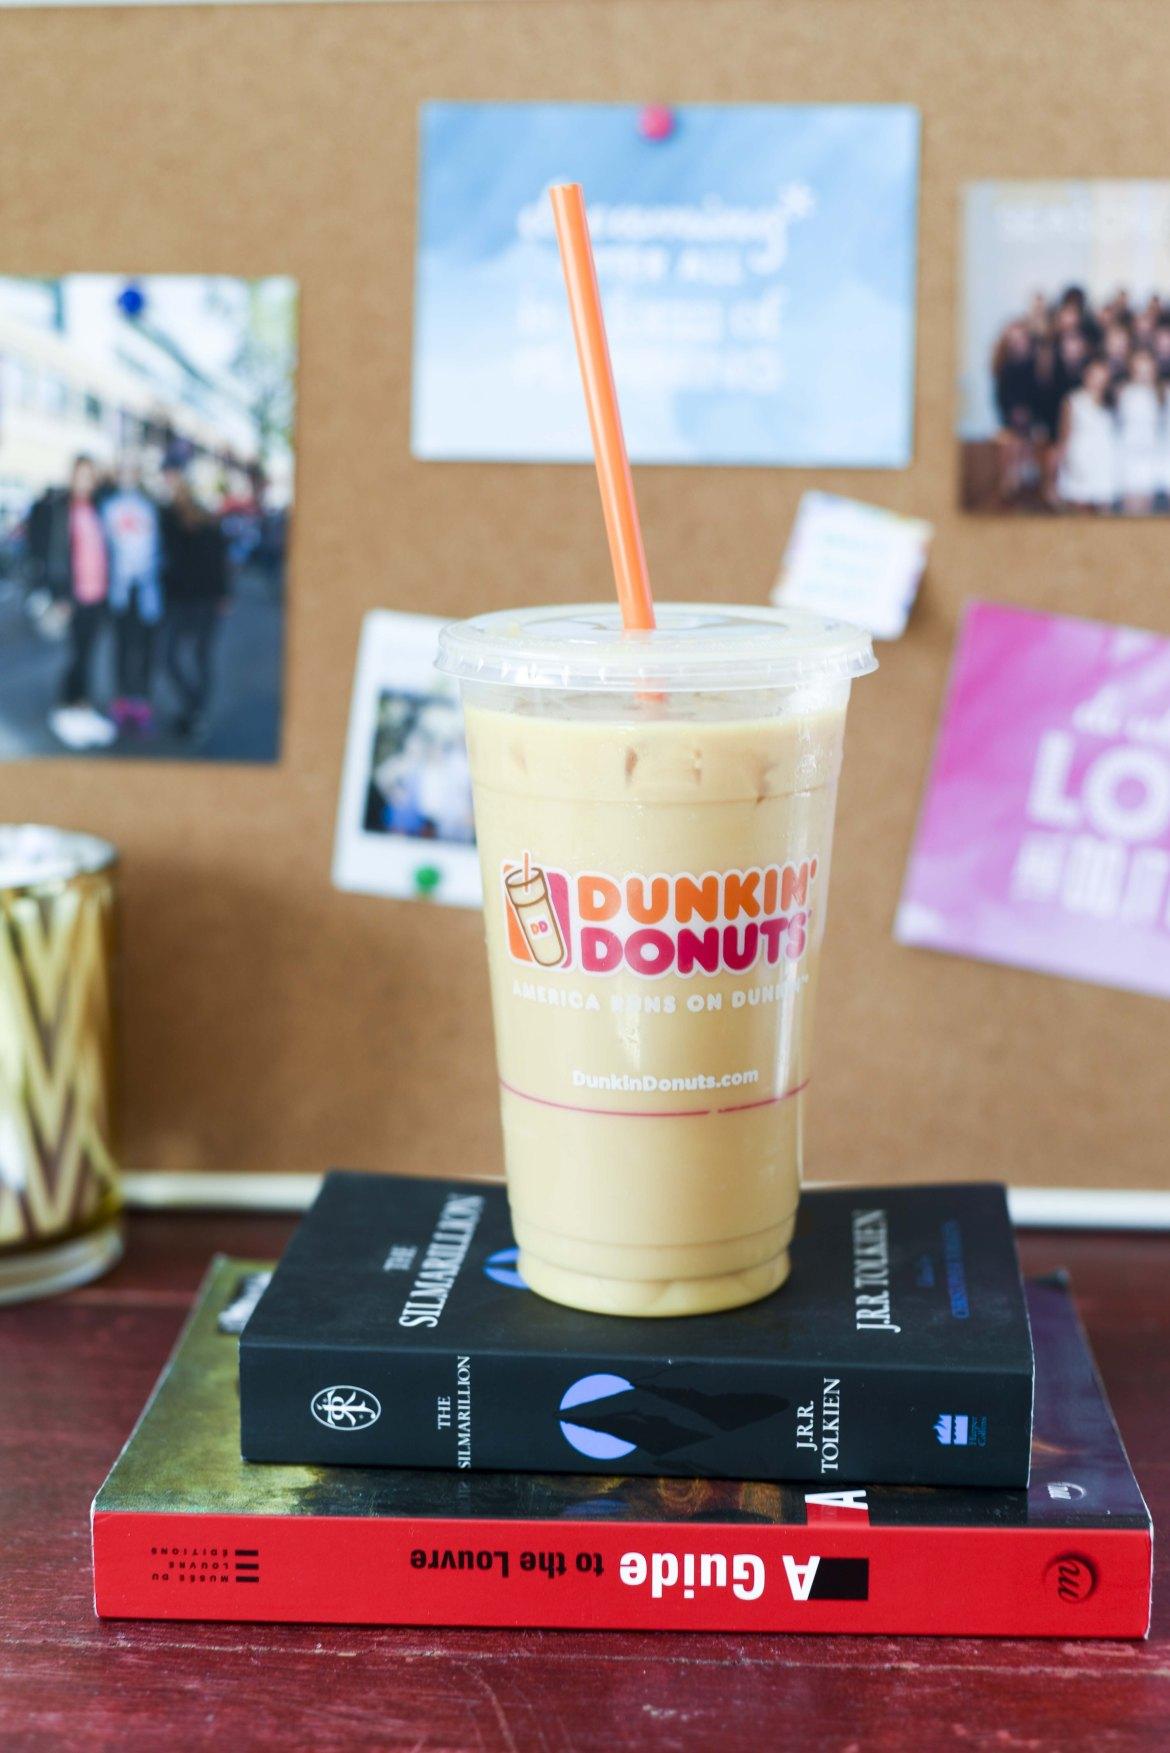 Dunkin' Donuts + Endless May #ad